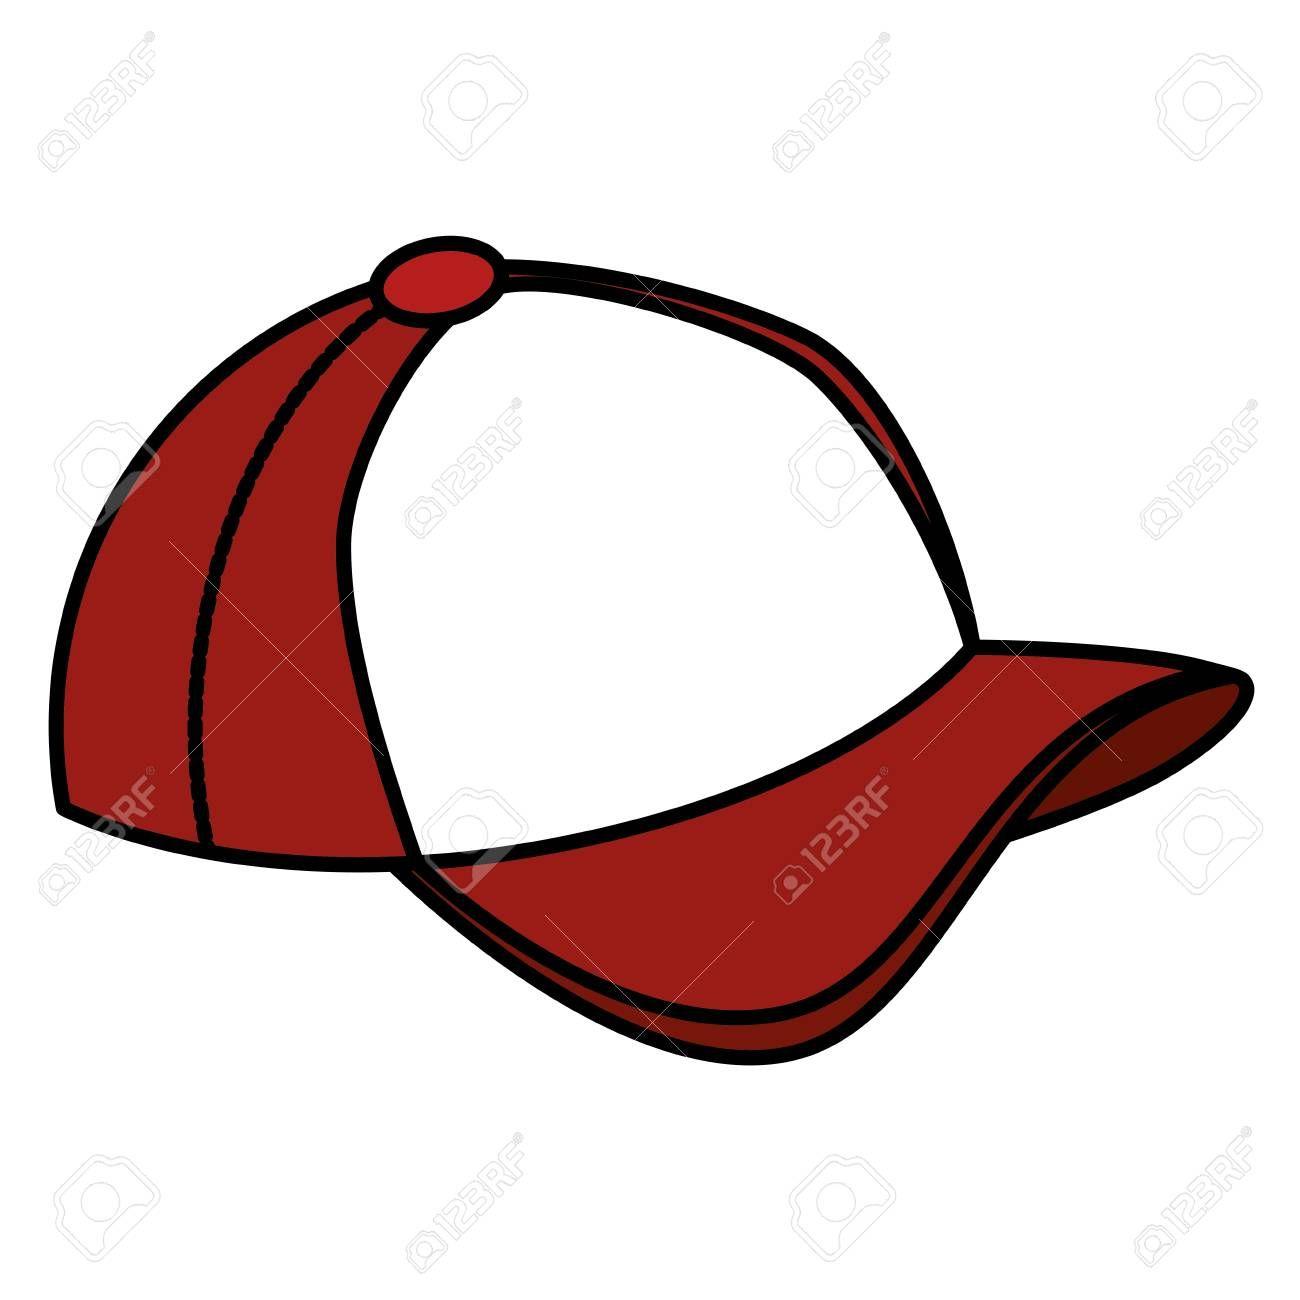 Baseball Cap Isolated Icon Vector Illustration Design Sponsored Isolated Cap Baseball Web Design Trends Vector Illustration Design Illustration Design